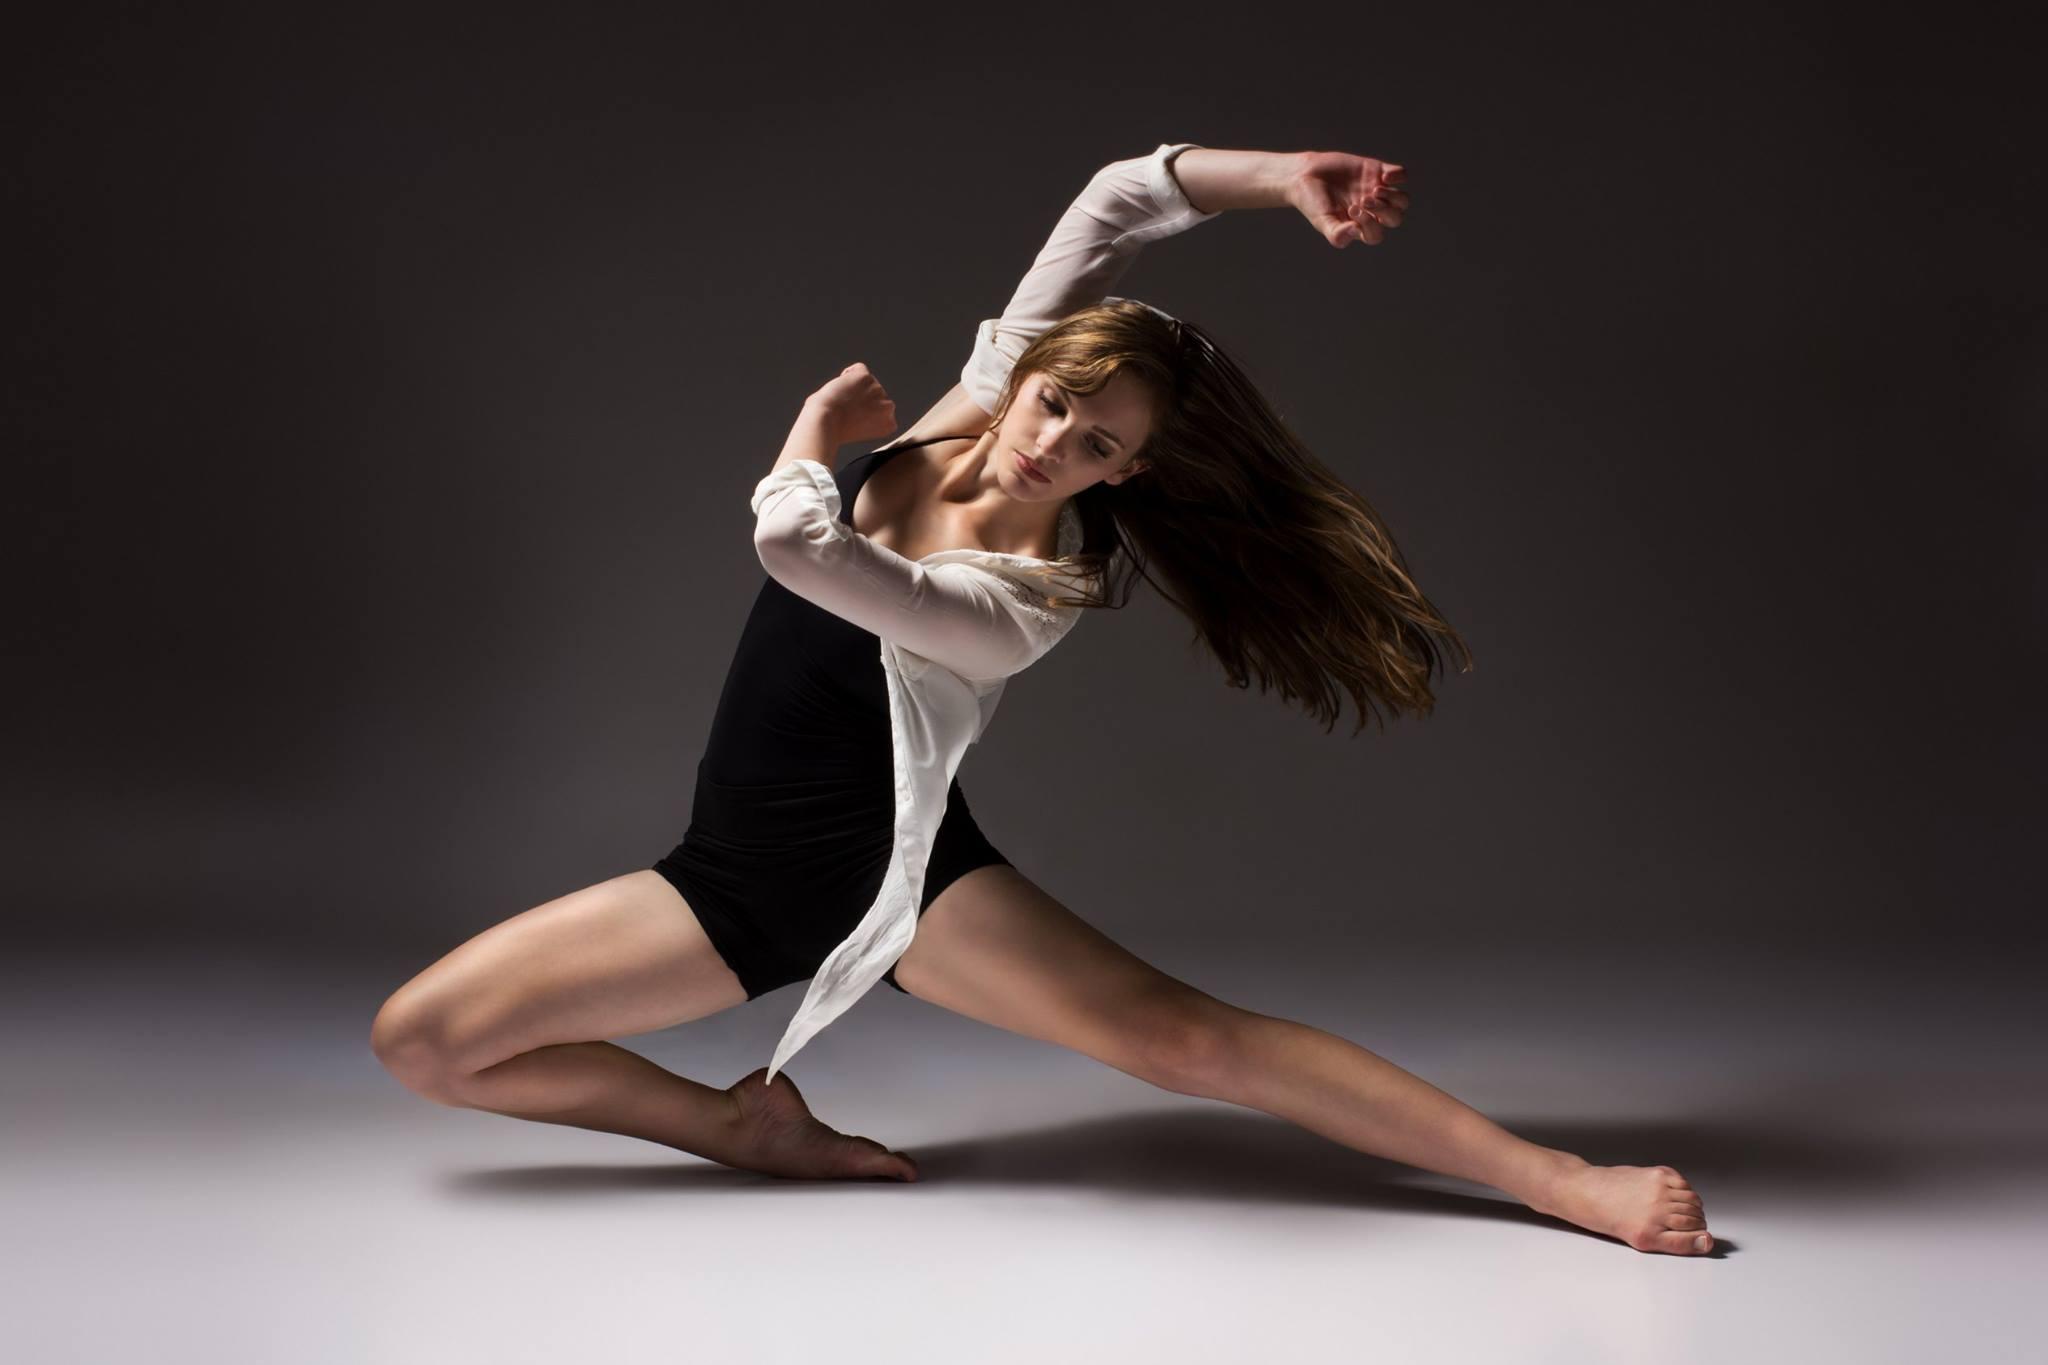 You are currently viewing Silhuetas de bailarinos